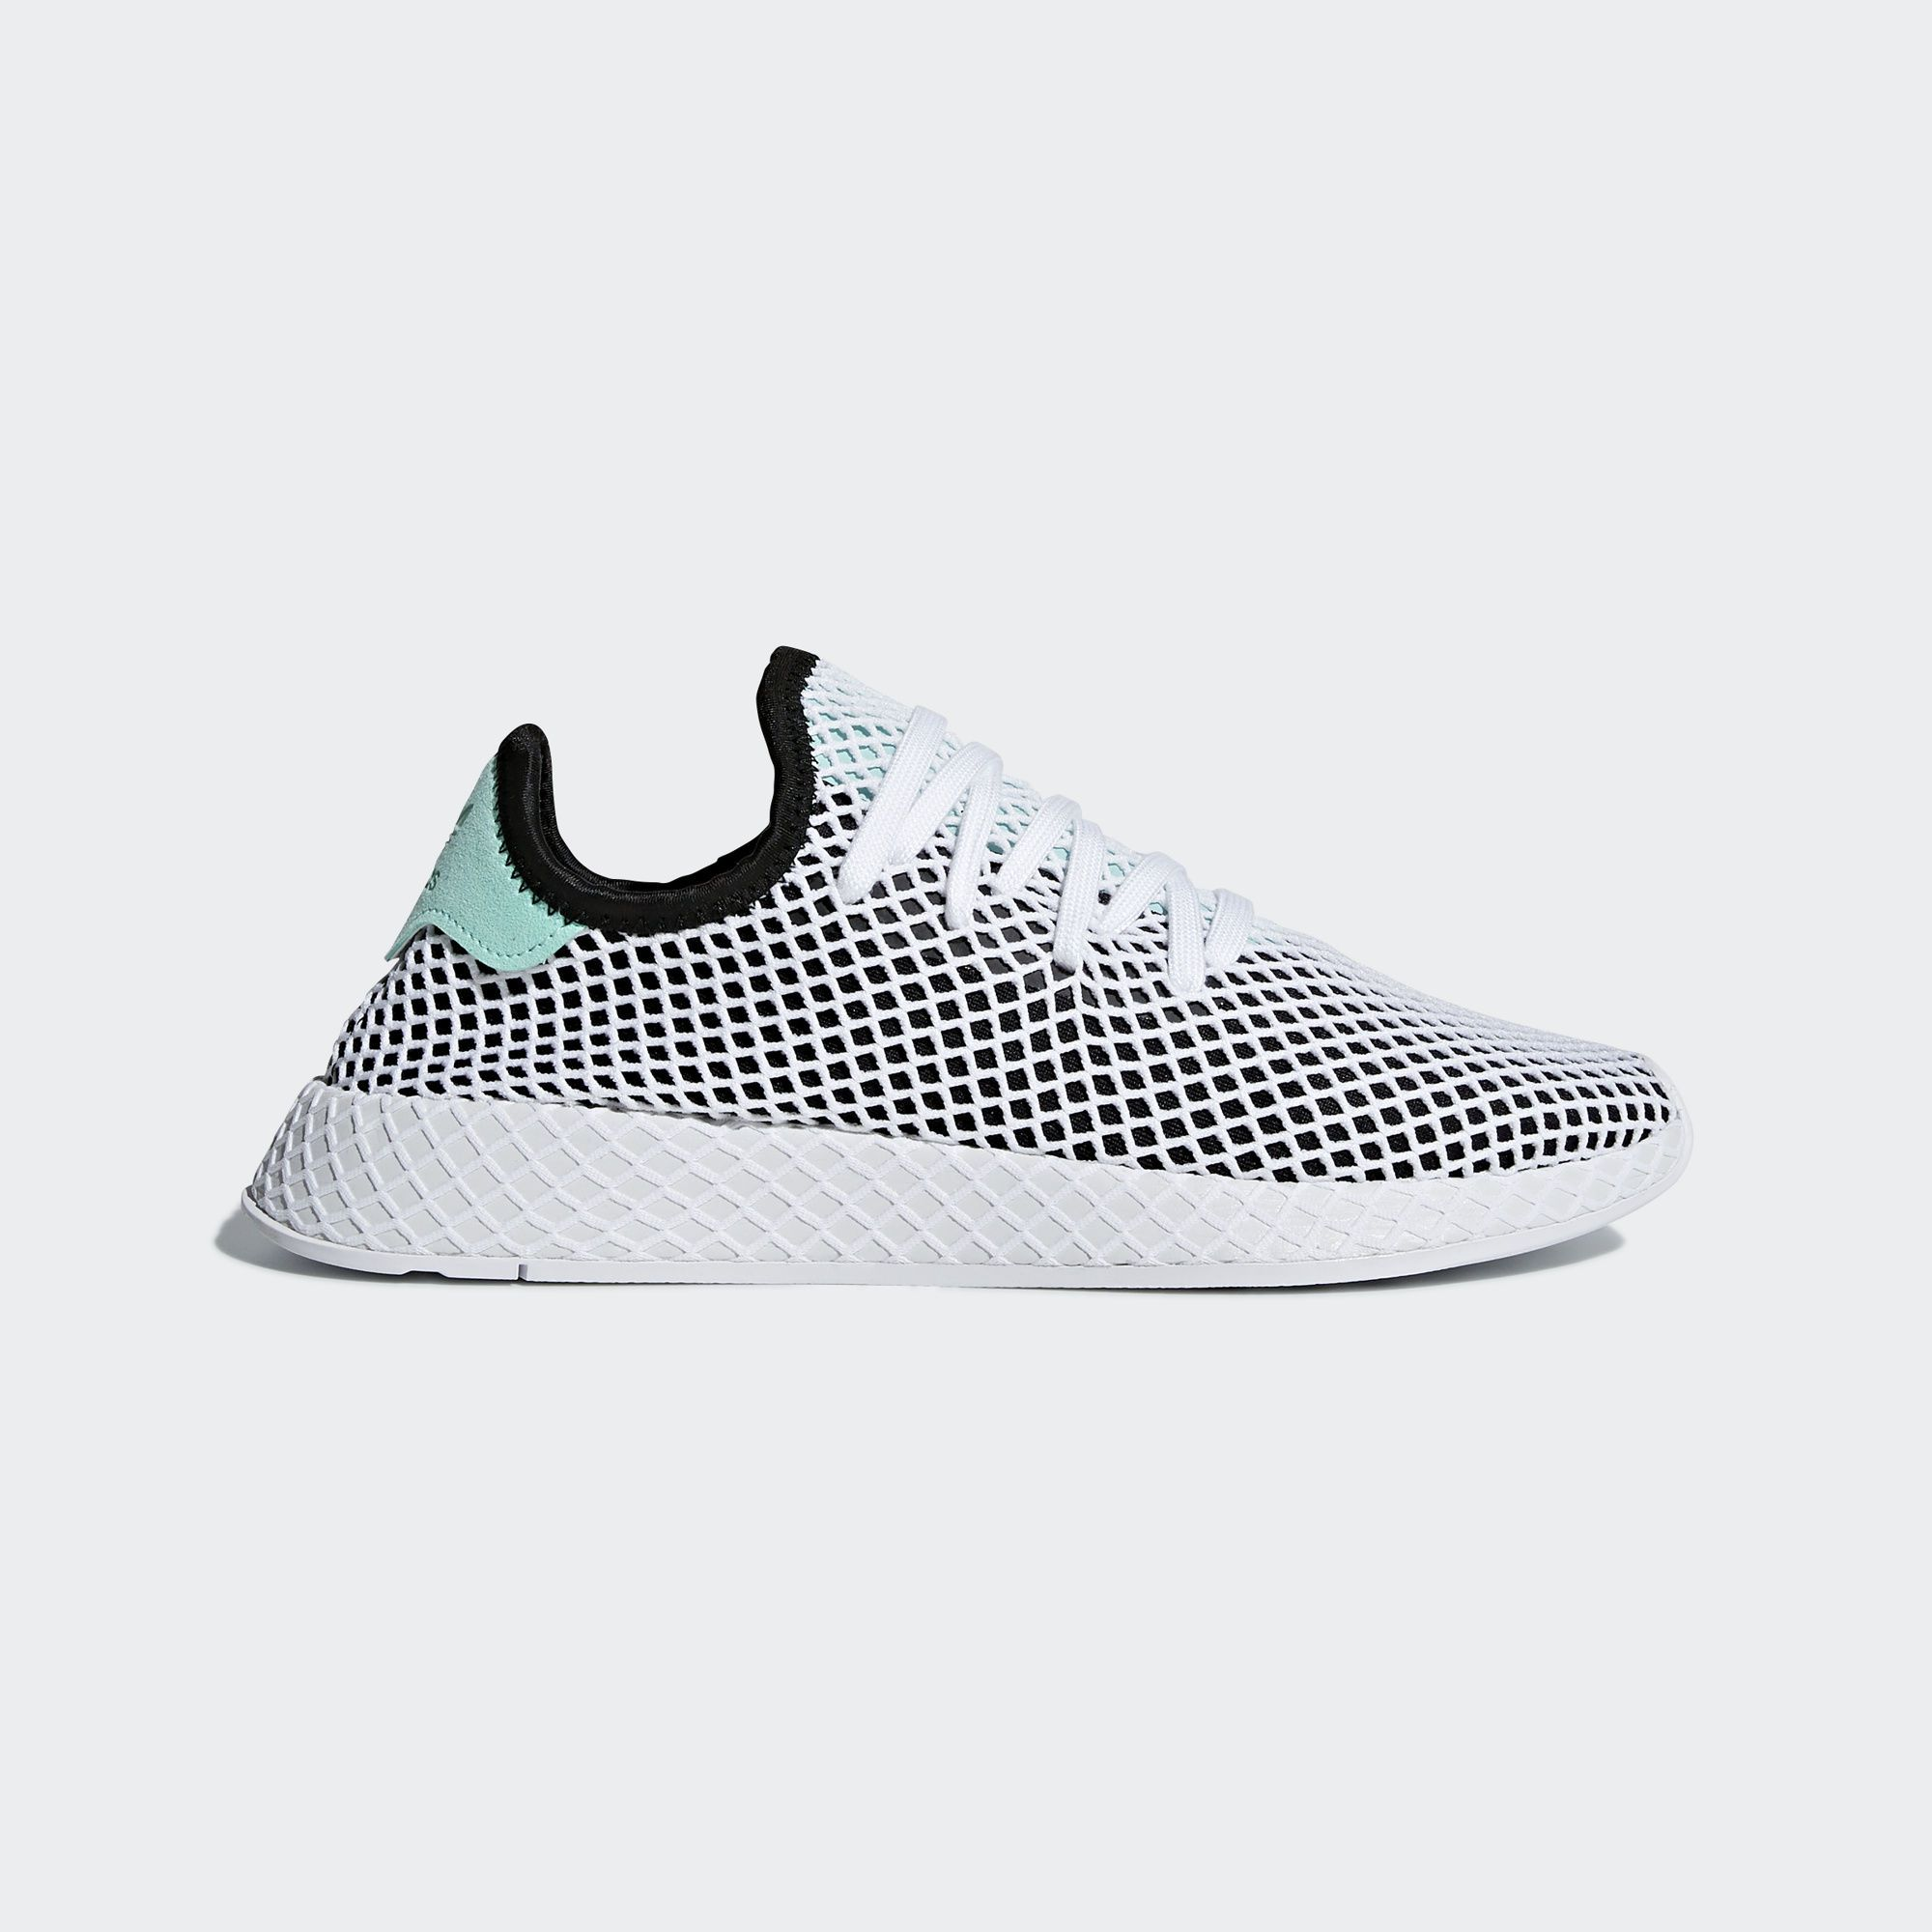 adidas Deerupt Runner Shoes | Men's Fashion that I love